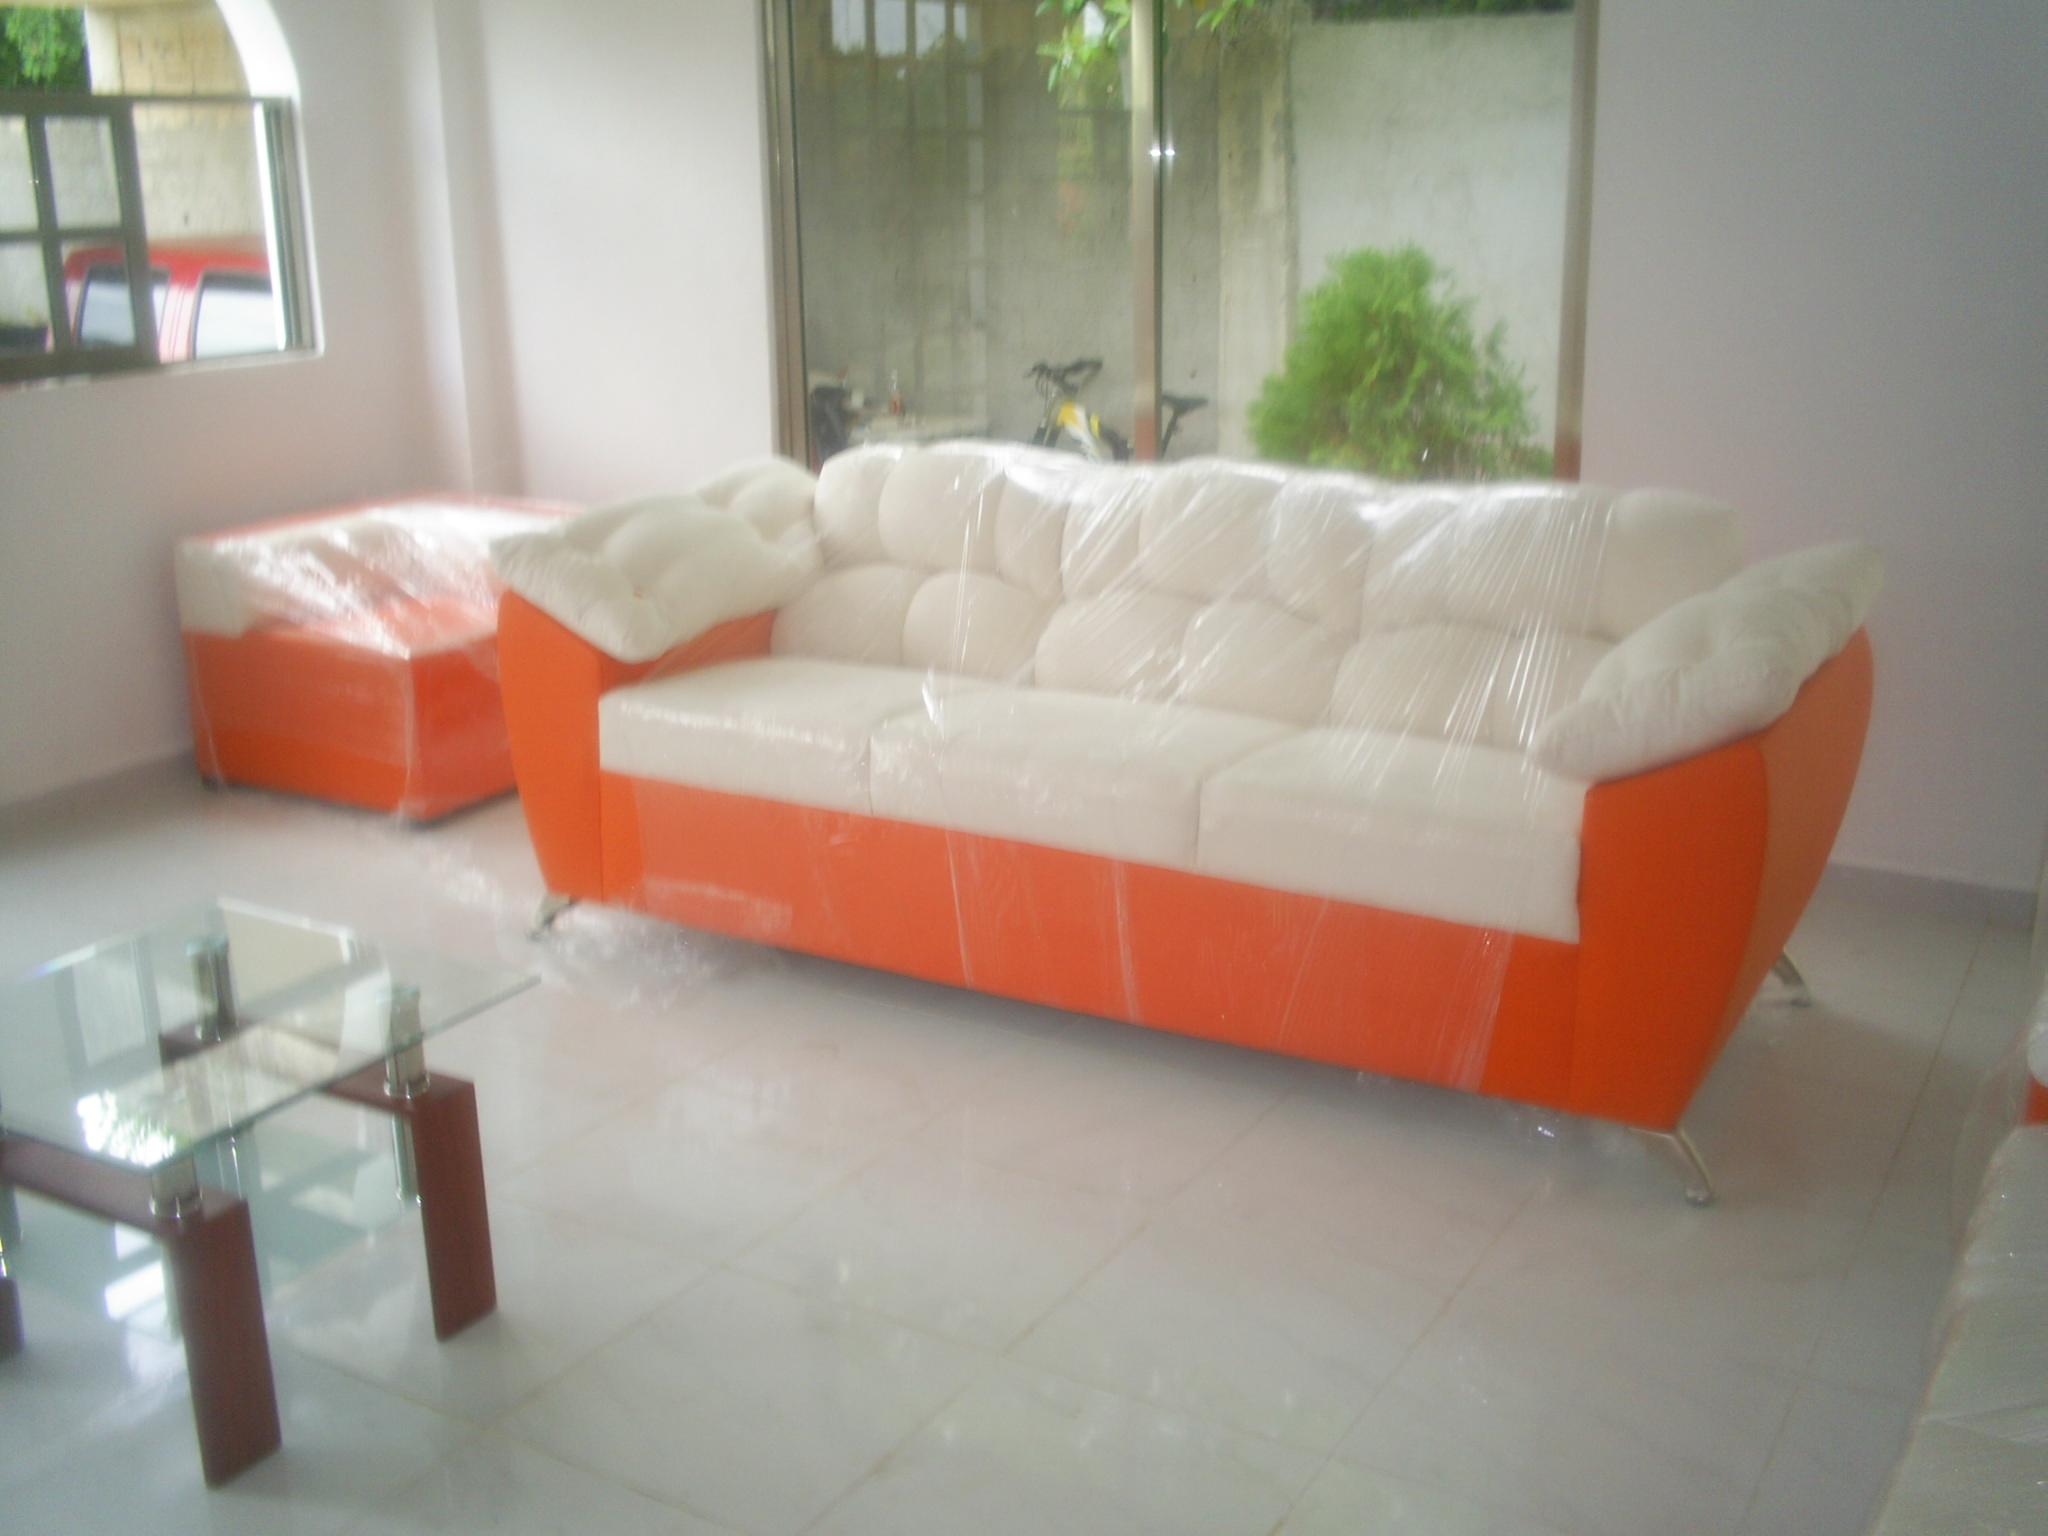 Fabrica de muebles san luis m rida for Muebles de fabrica